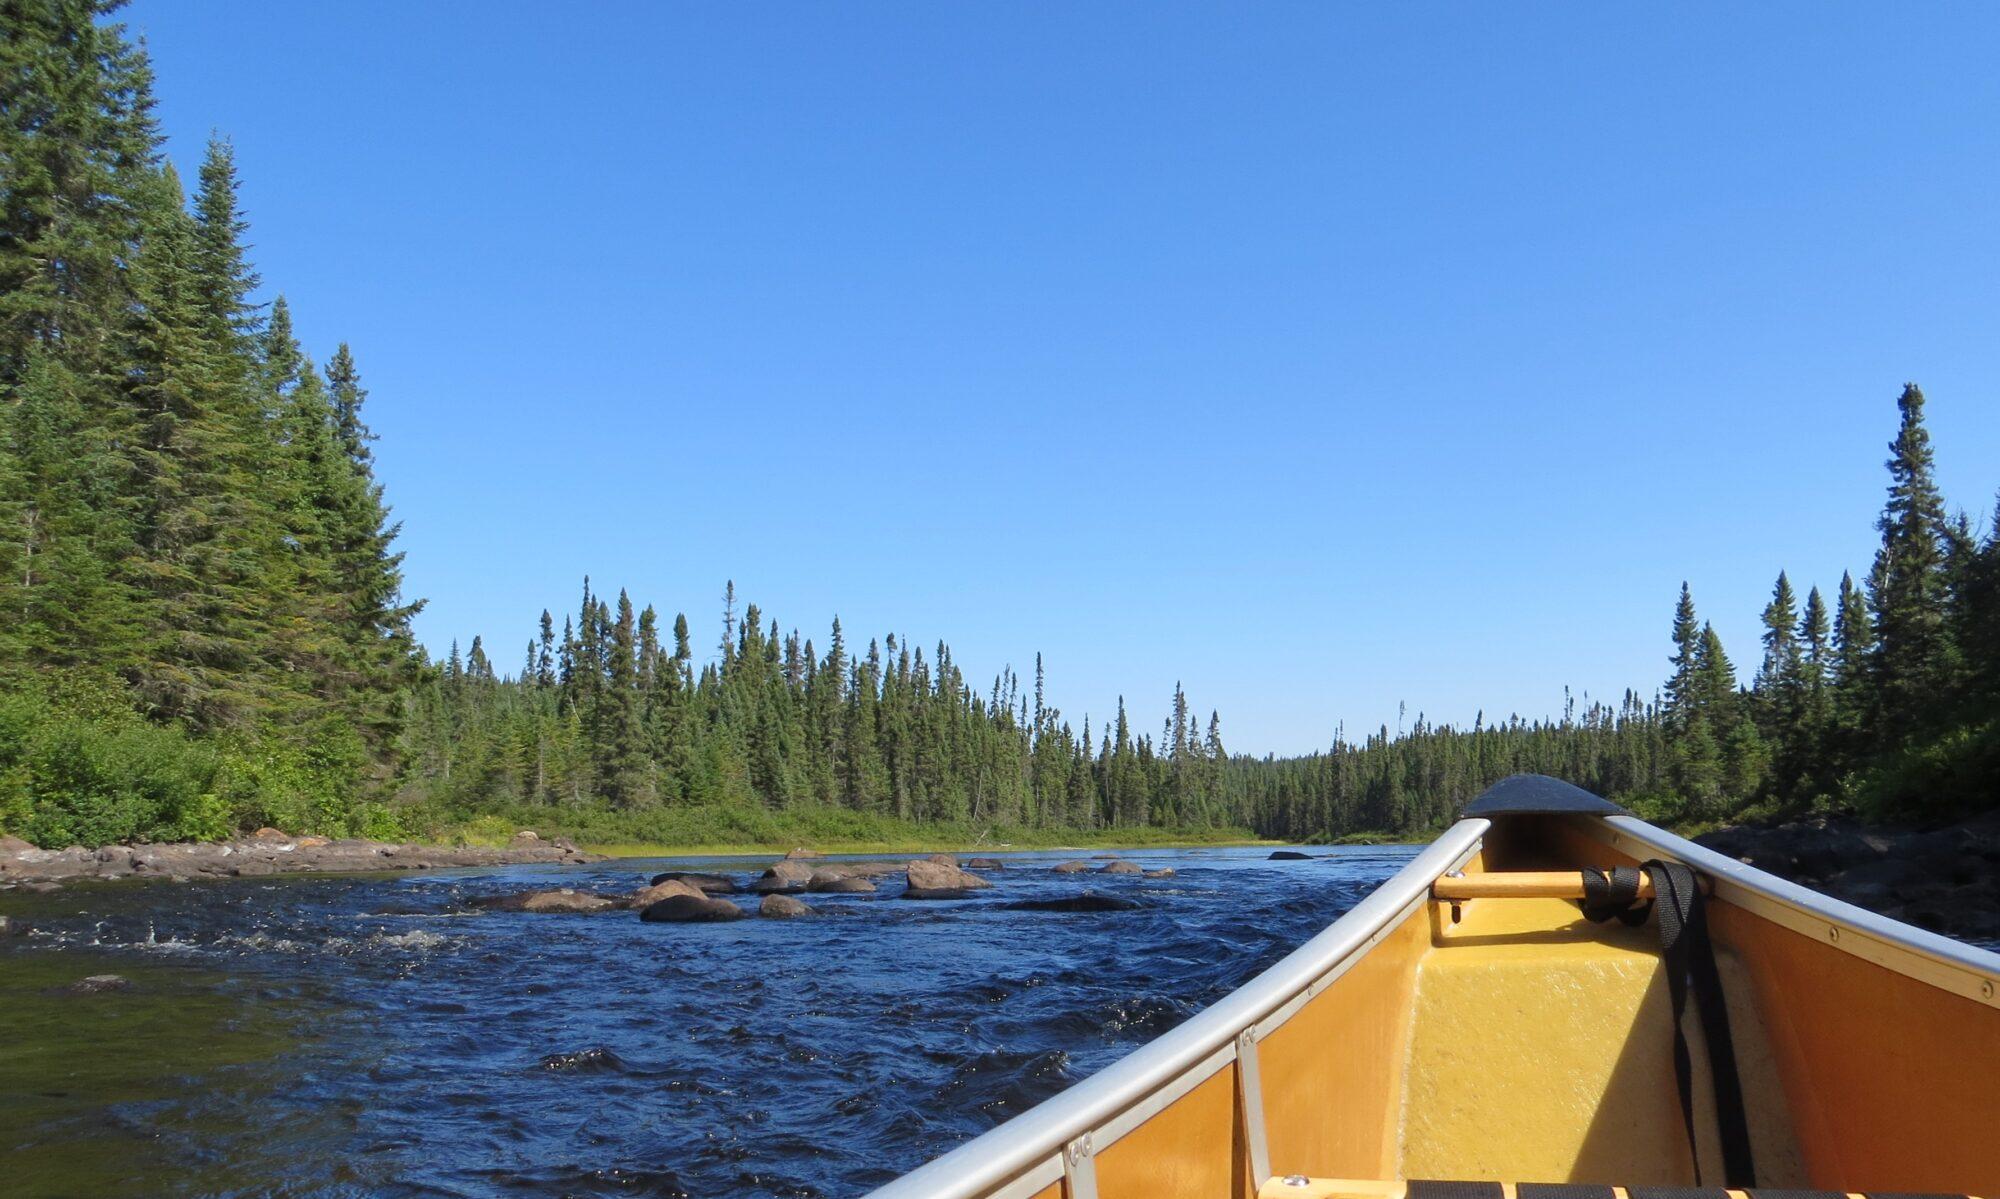 Canoeing across Canada